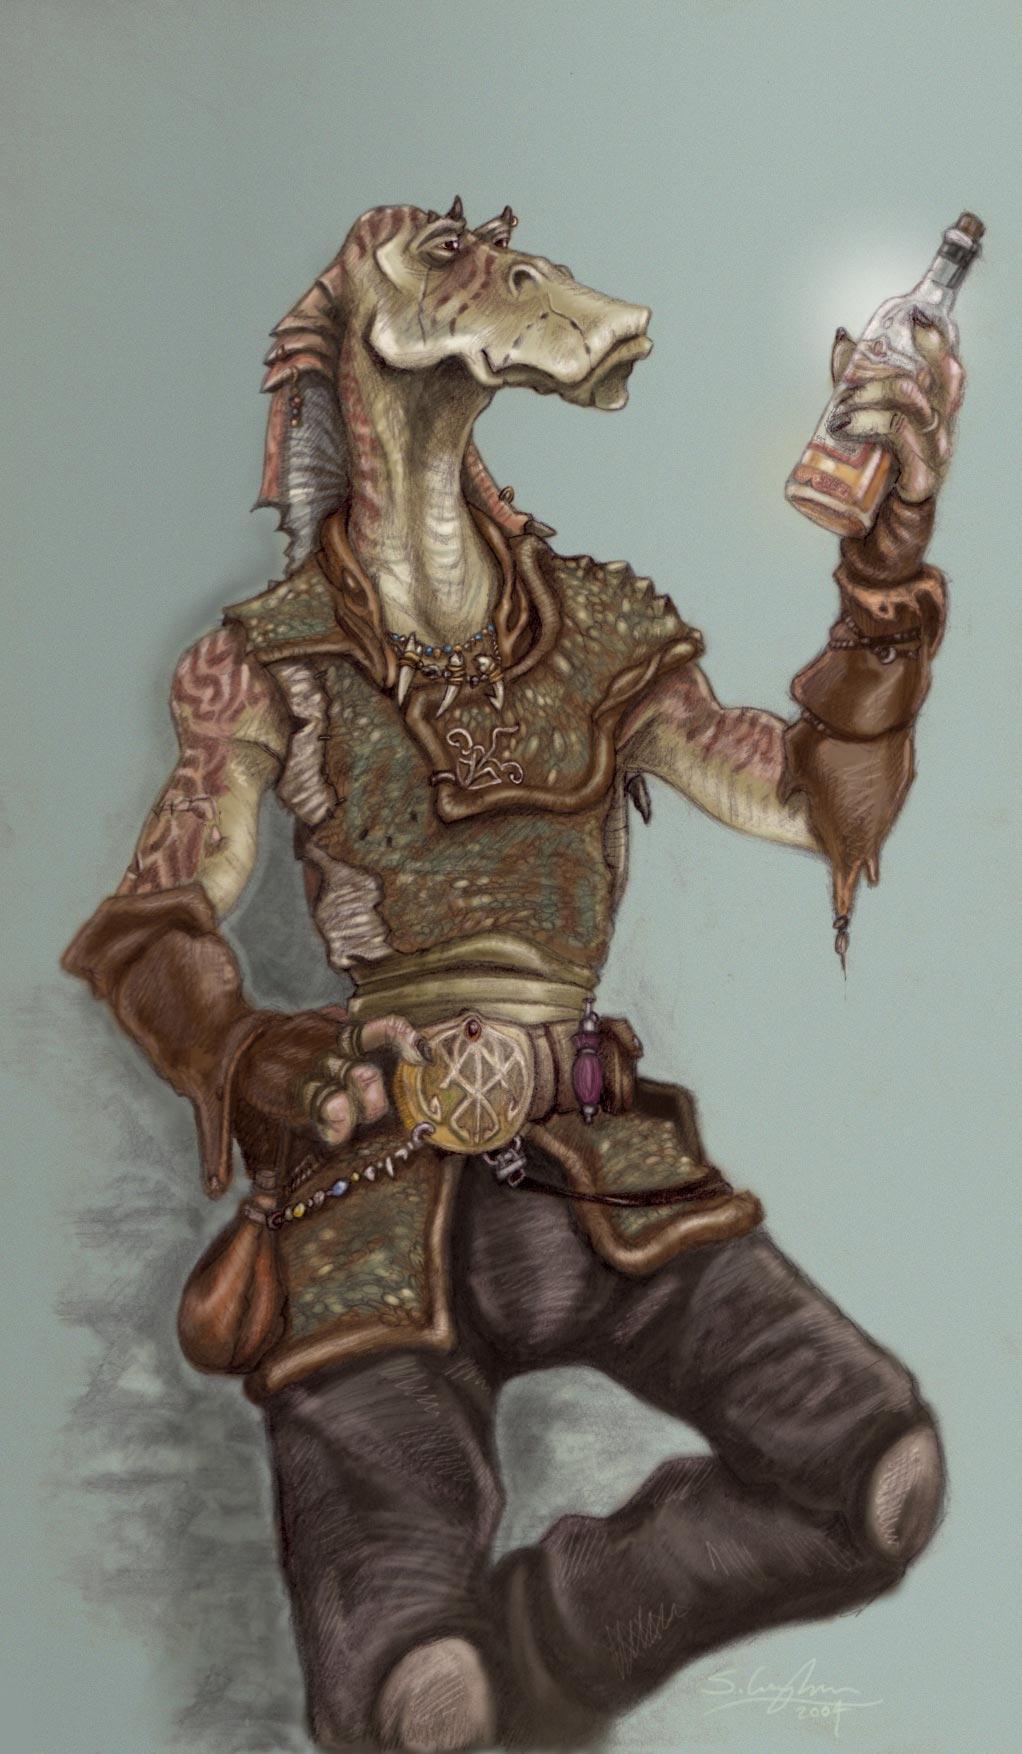 Gungan Smuggler by StuCunningham on DeviantArt